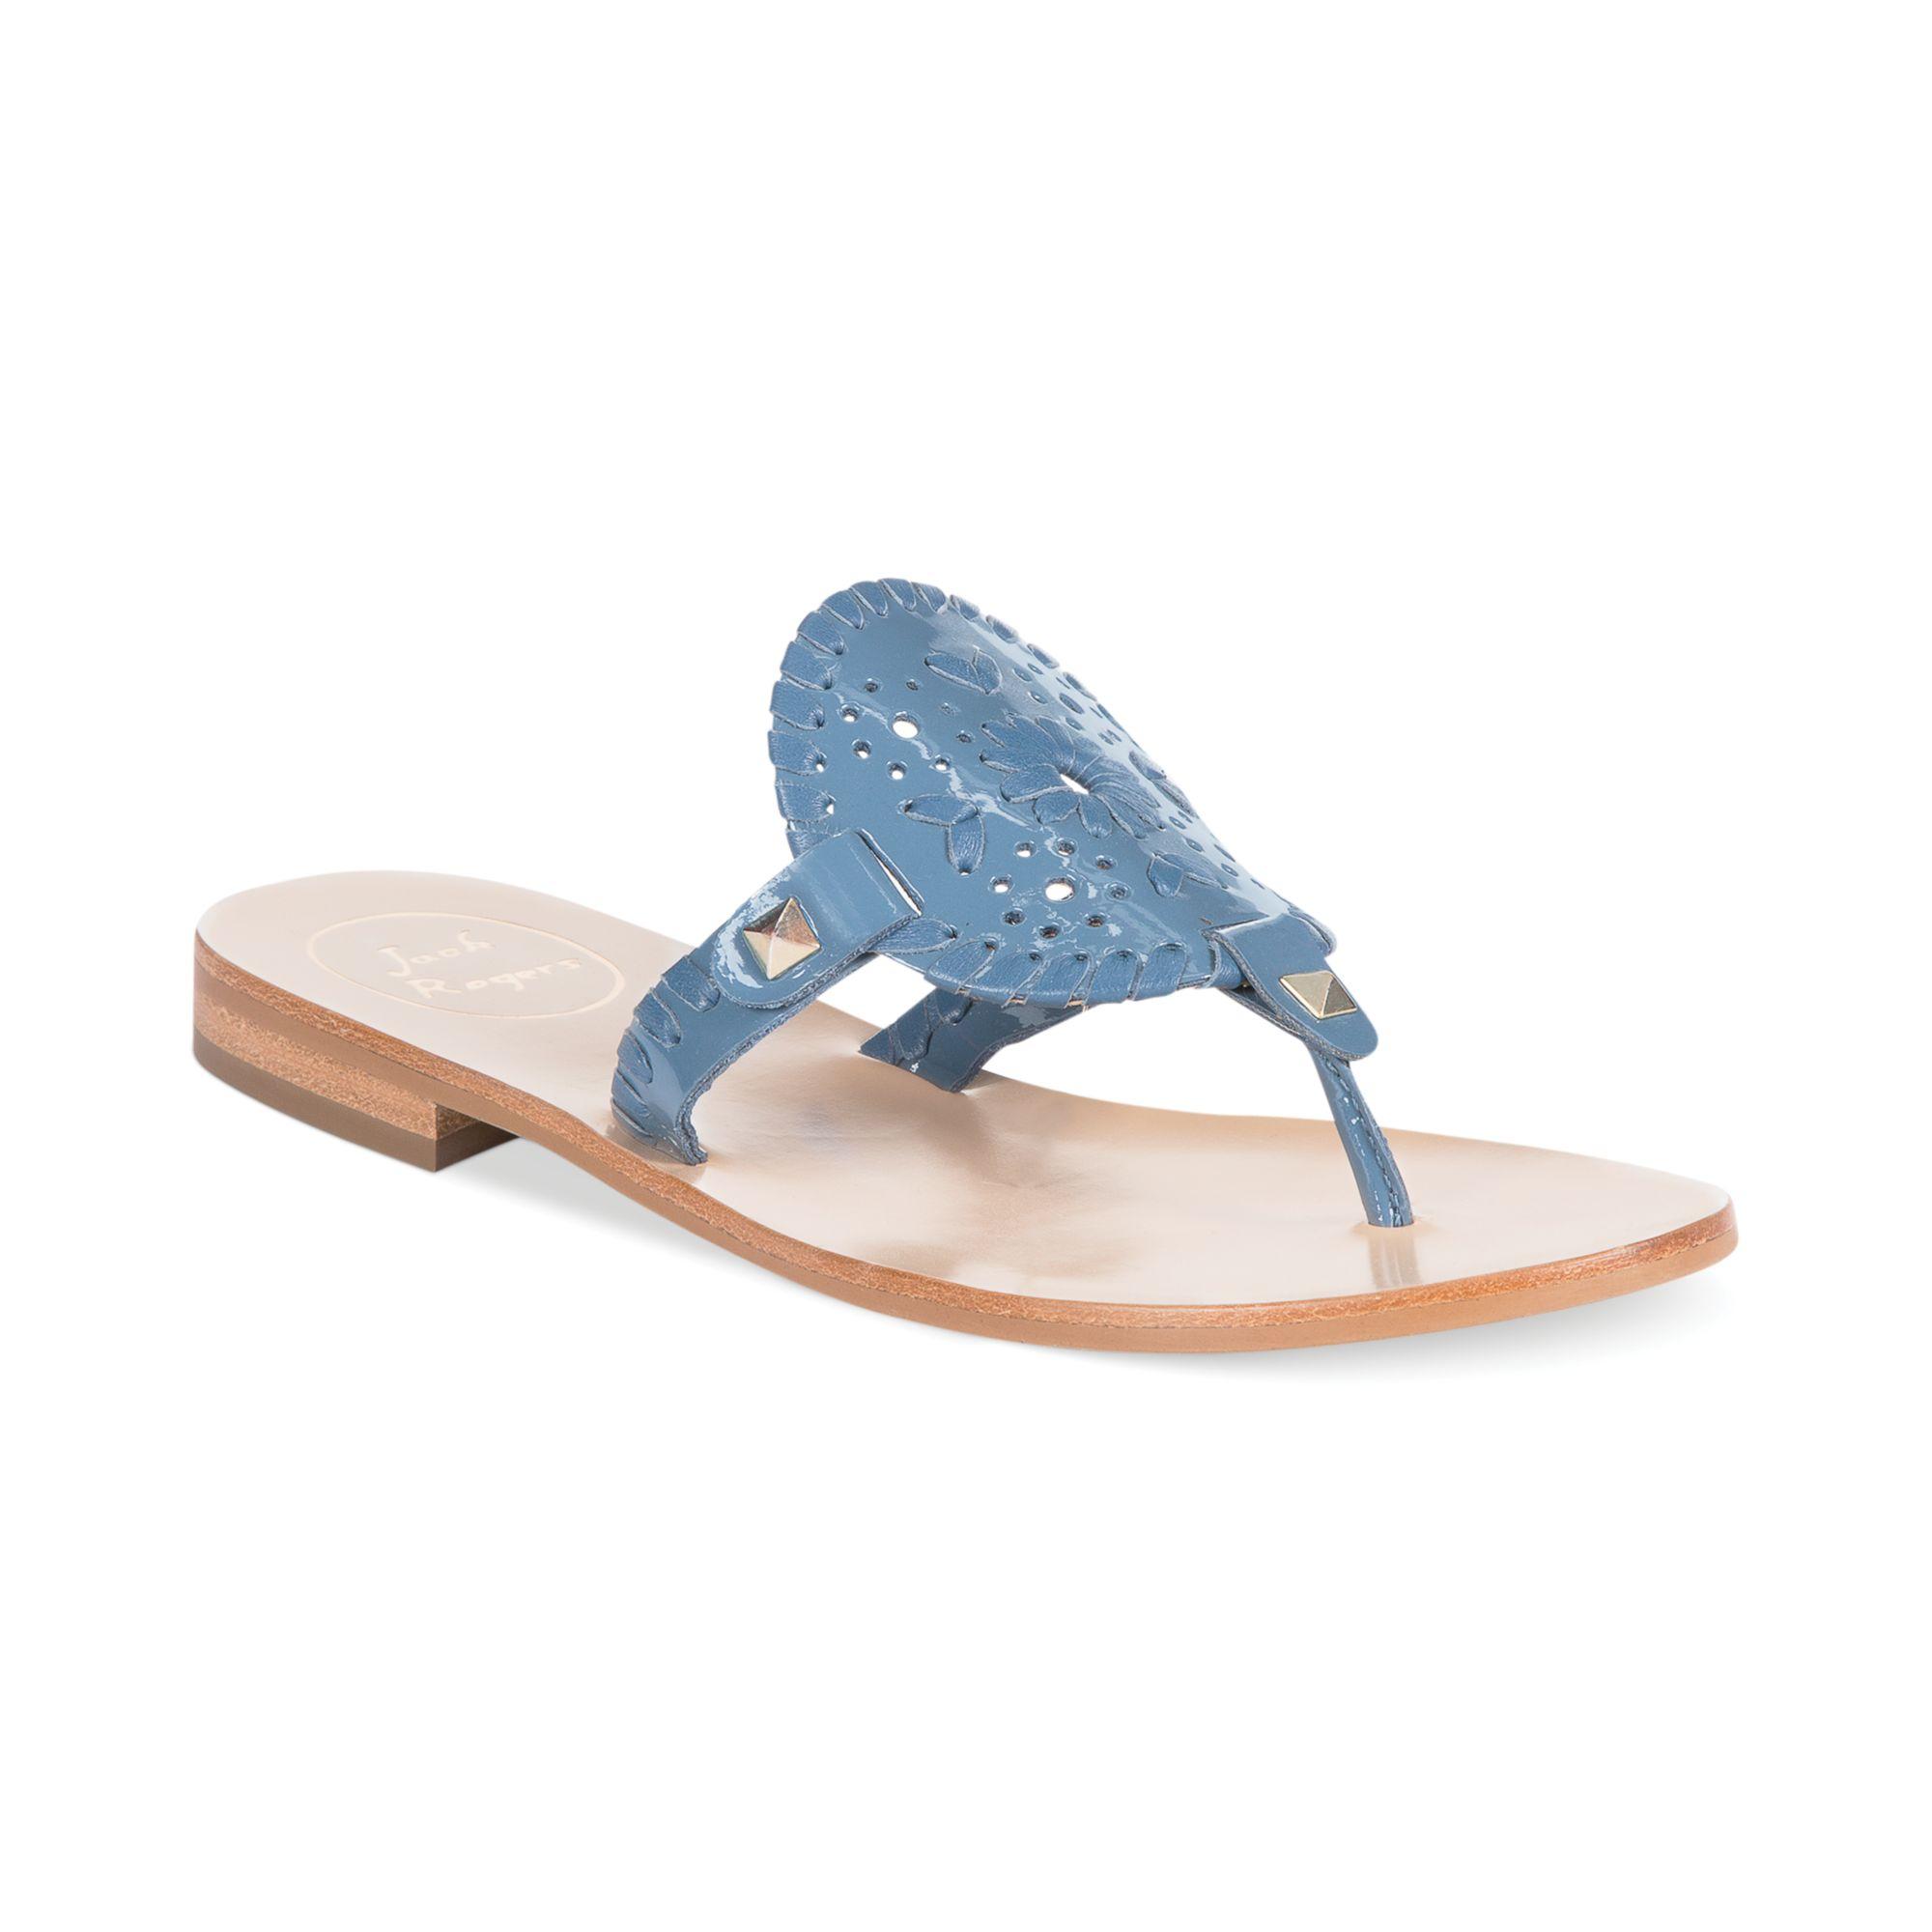 9cc57e90e949 Lyst - Jack Rogers Georgica Flat Thong Sandals in Blue